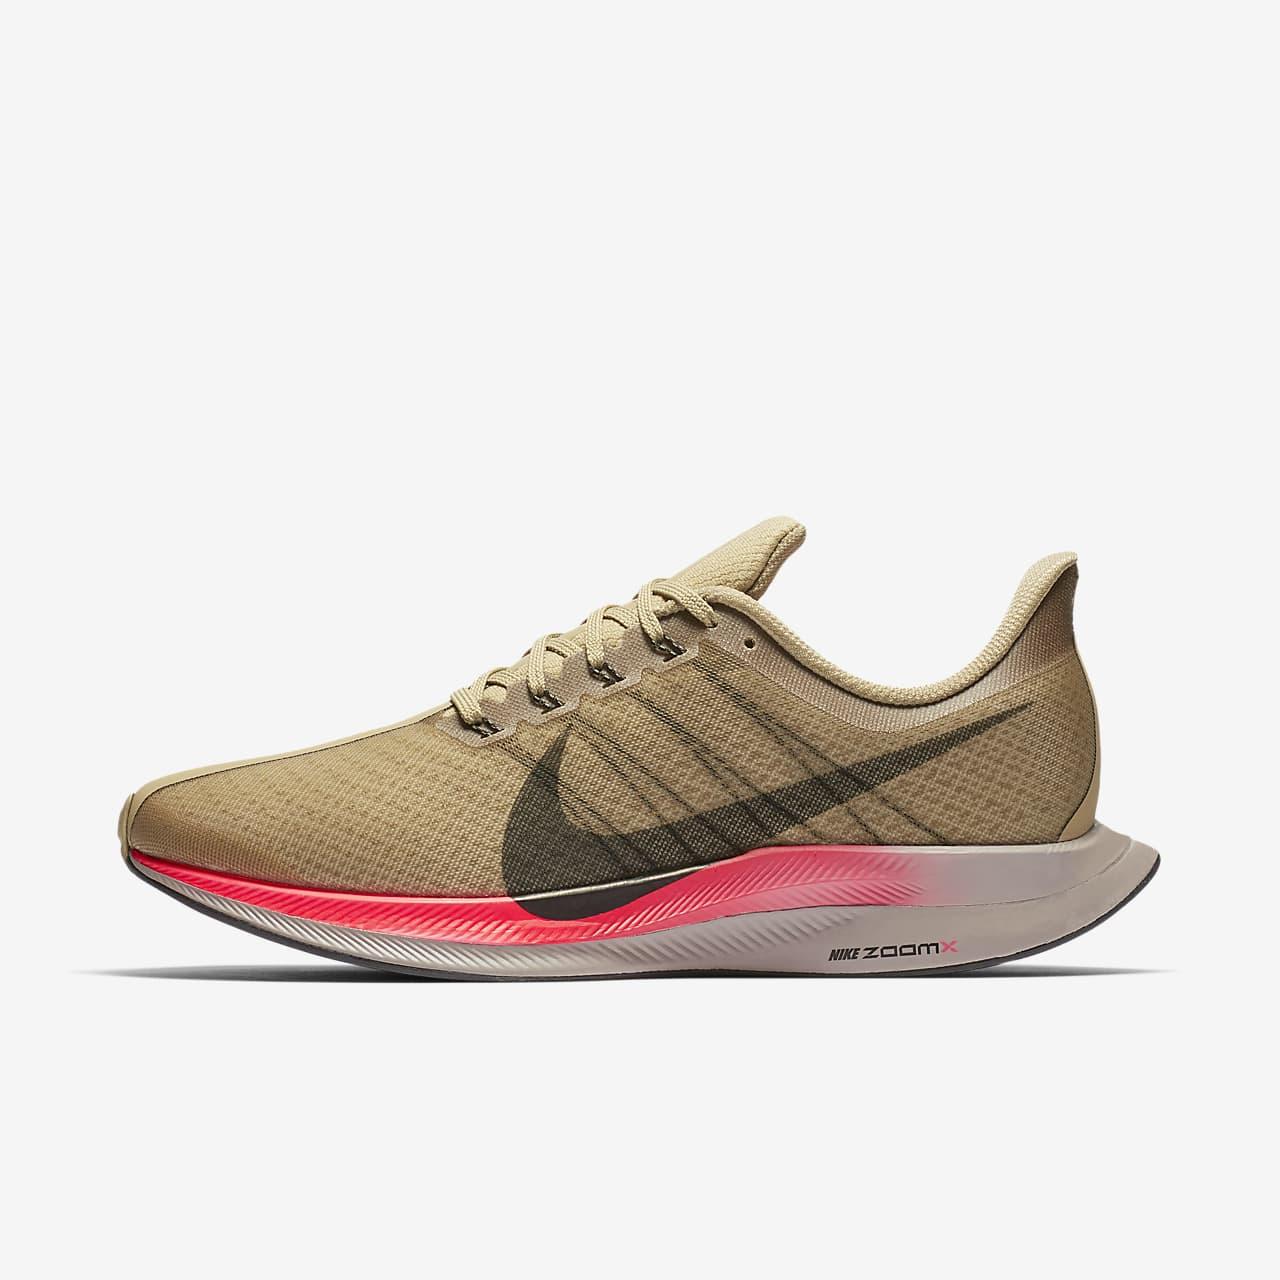 Nike Zoom Pegasus 35 Turbo 男款跑鞋。Nike TW